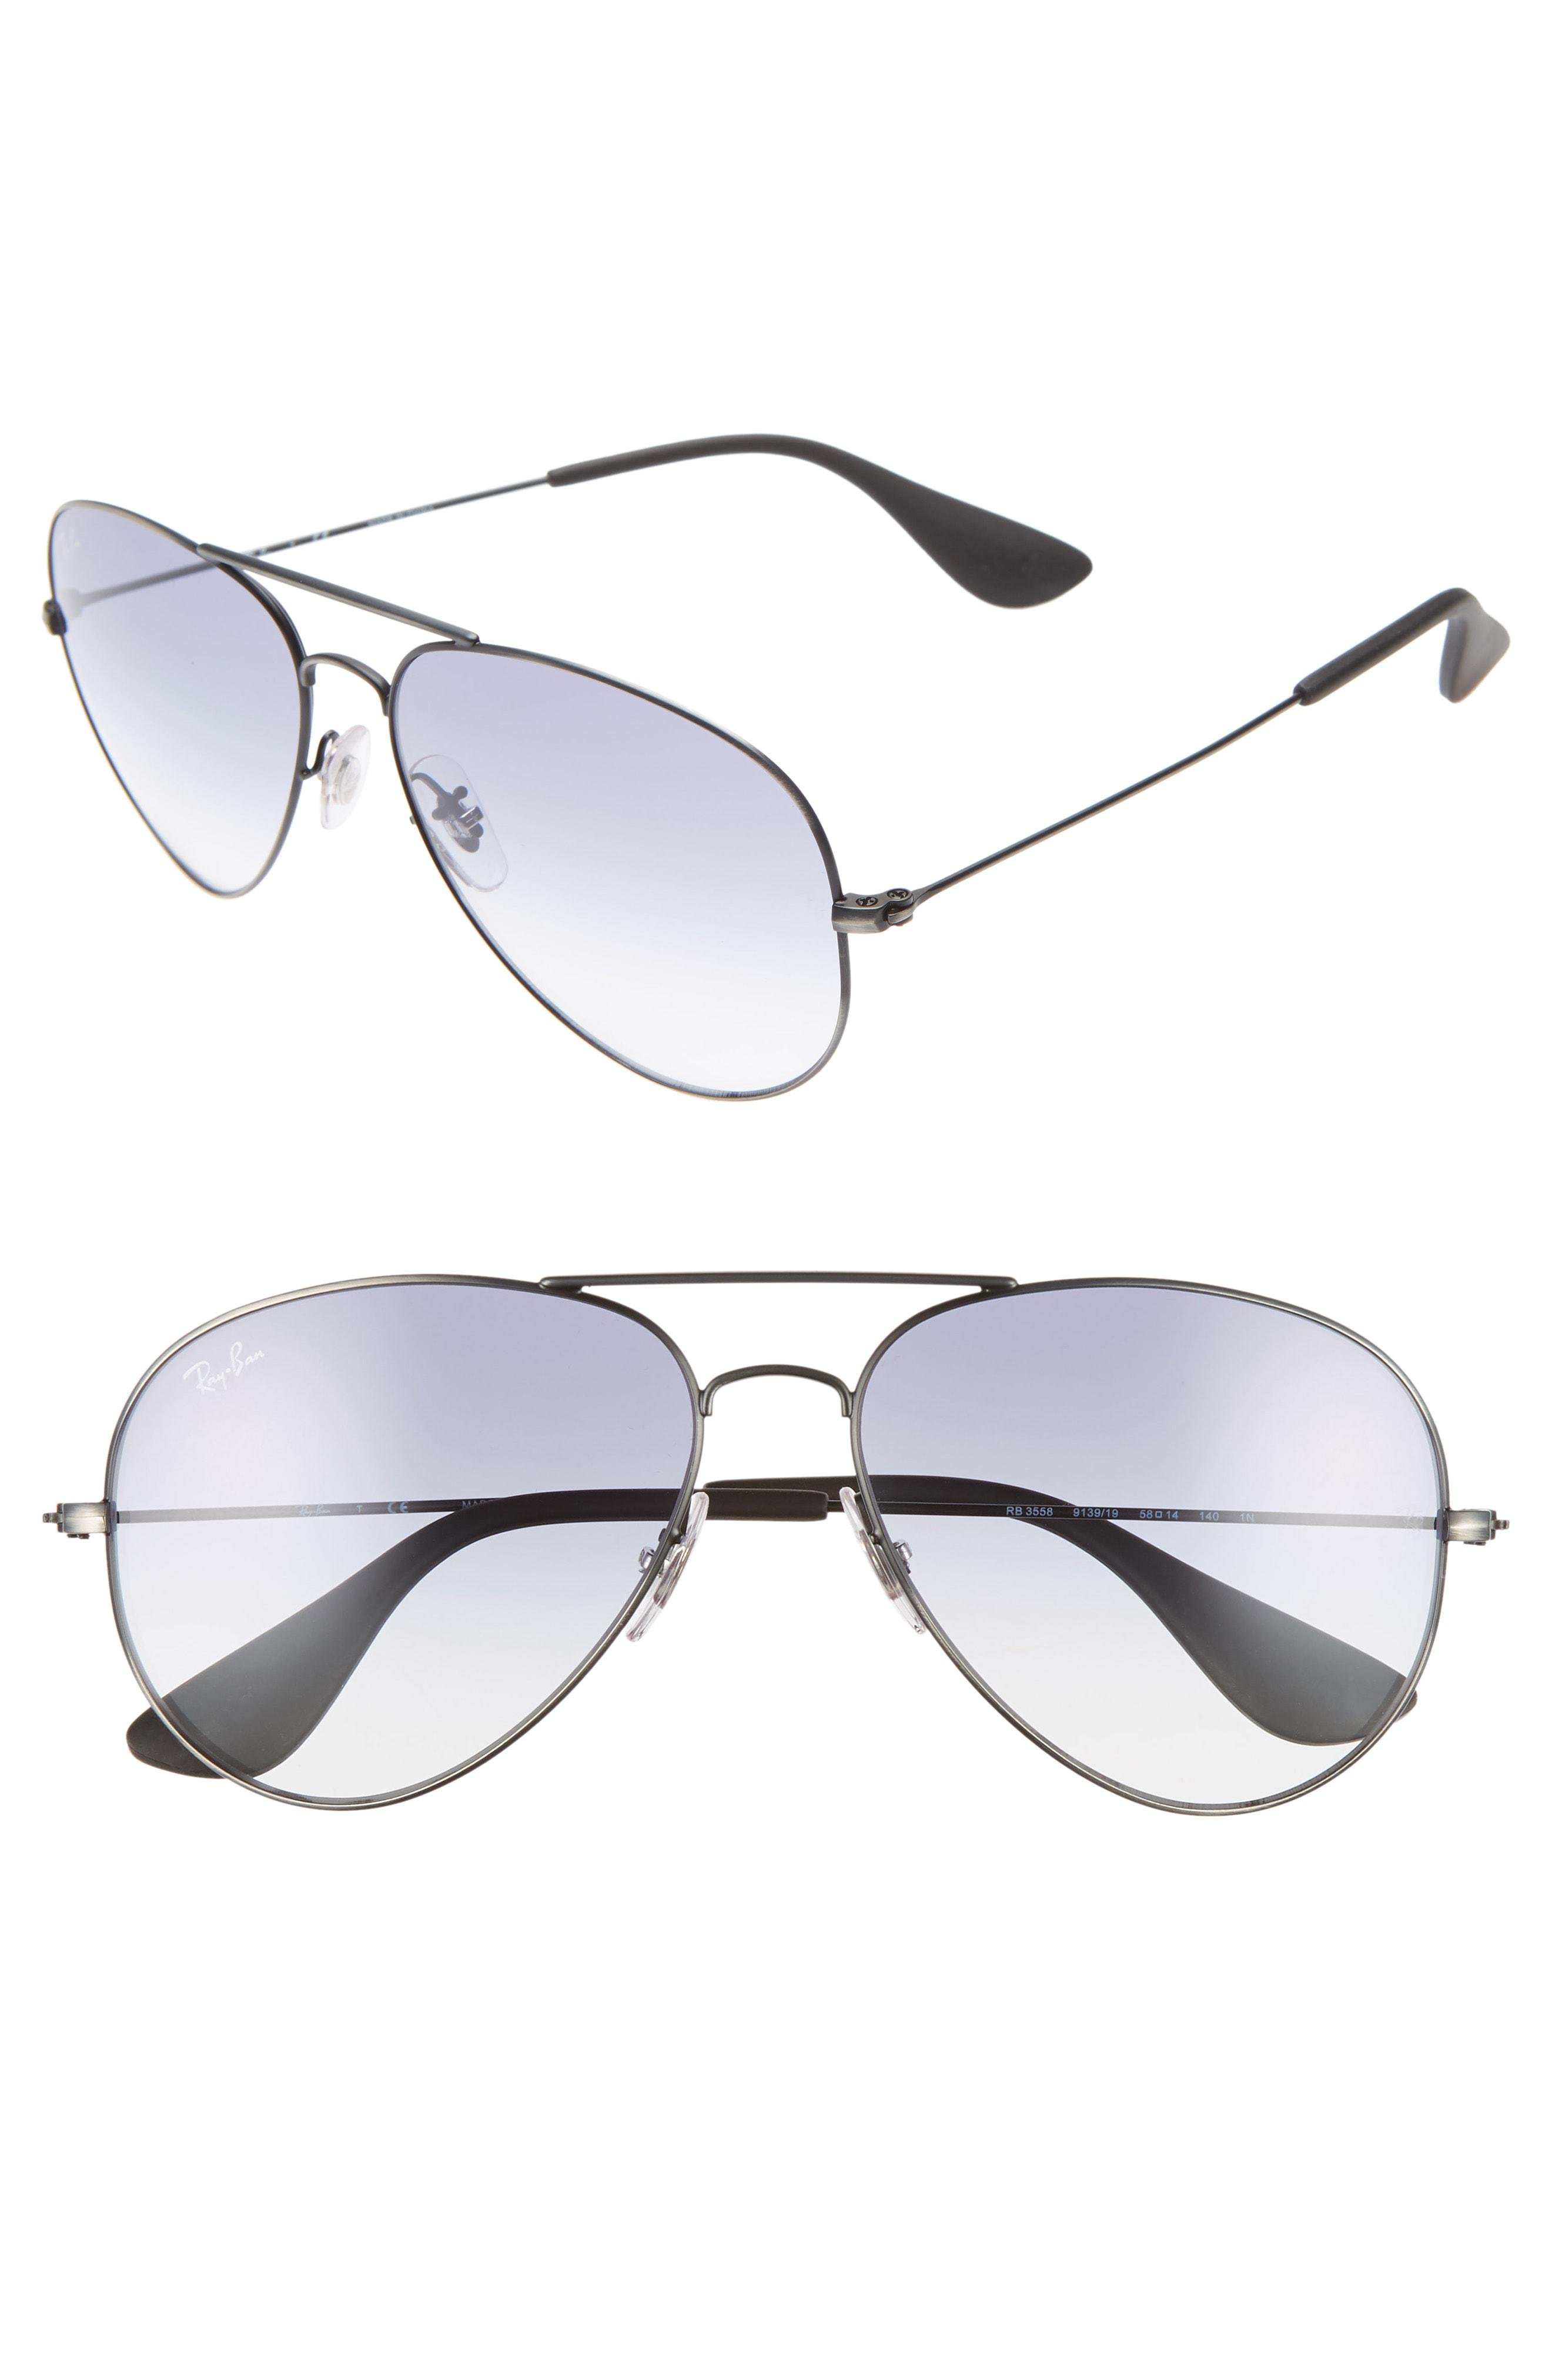 163e0afc64 Lyst - Ray-Ban 58mm Gradient Aviator Sunglasses - in Metallic